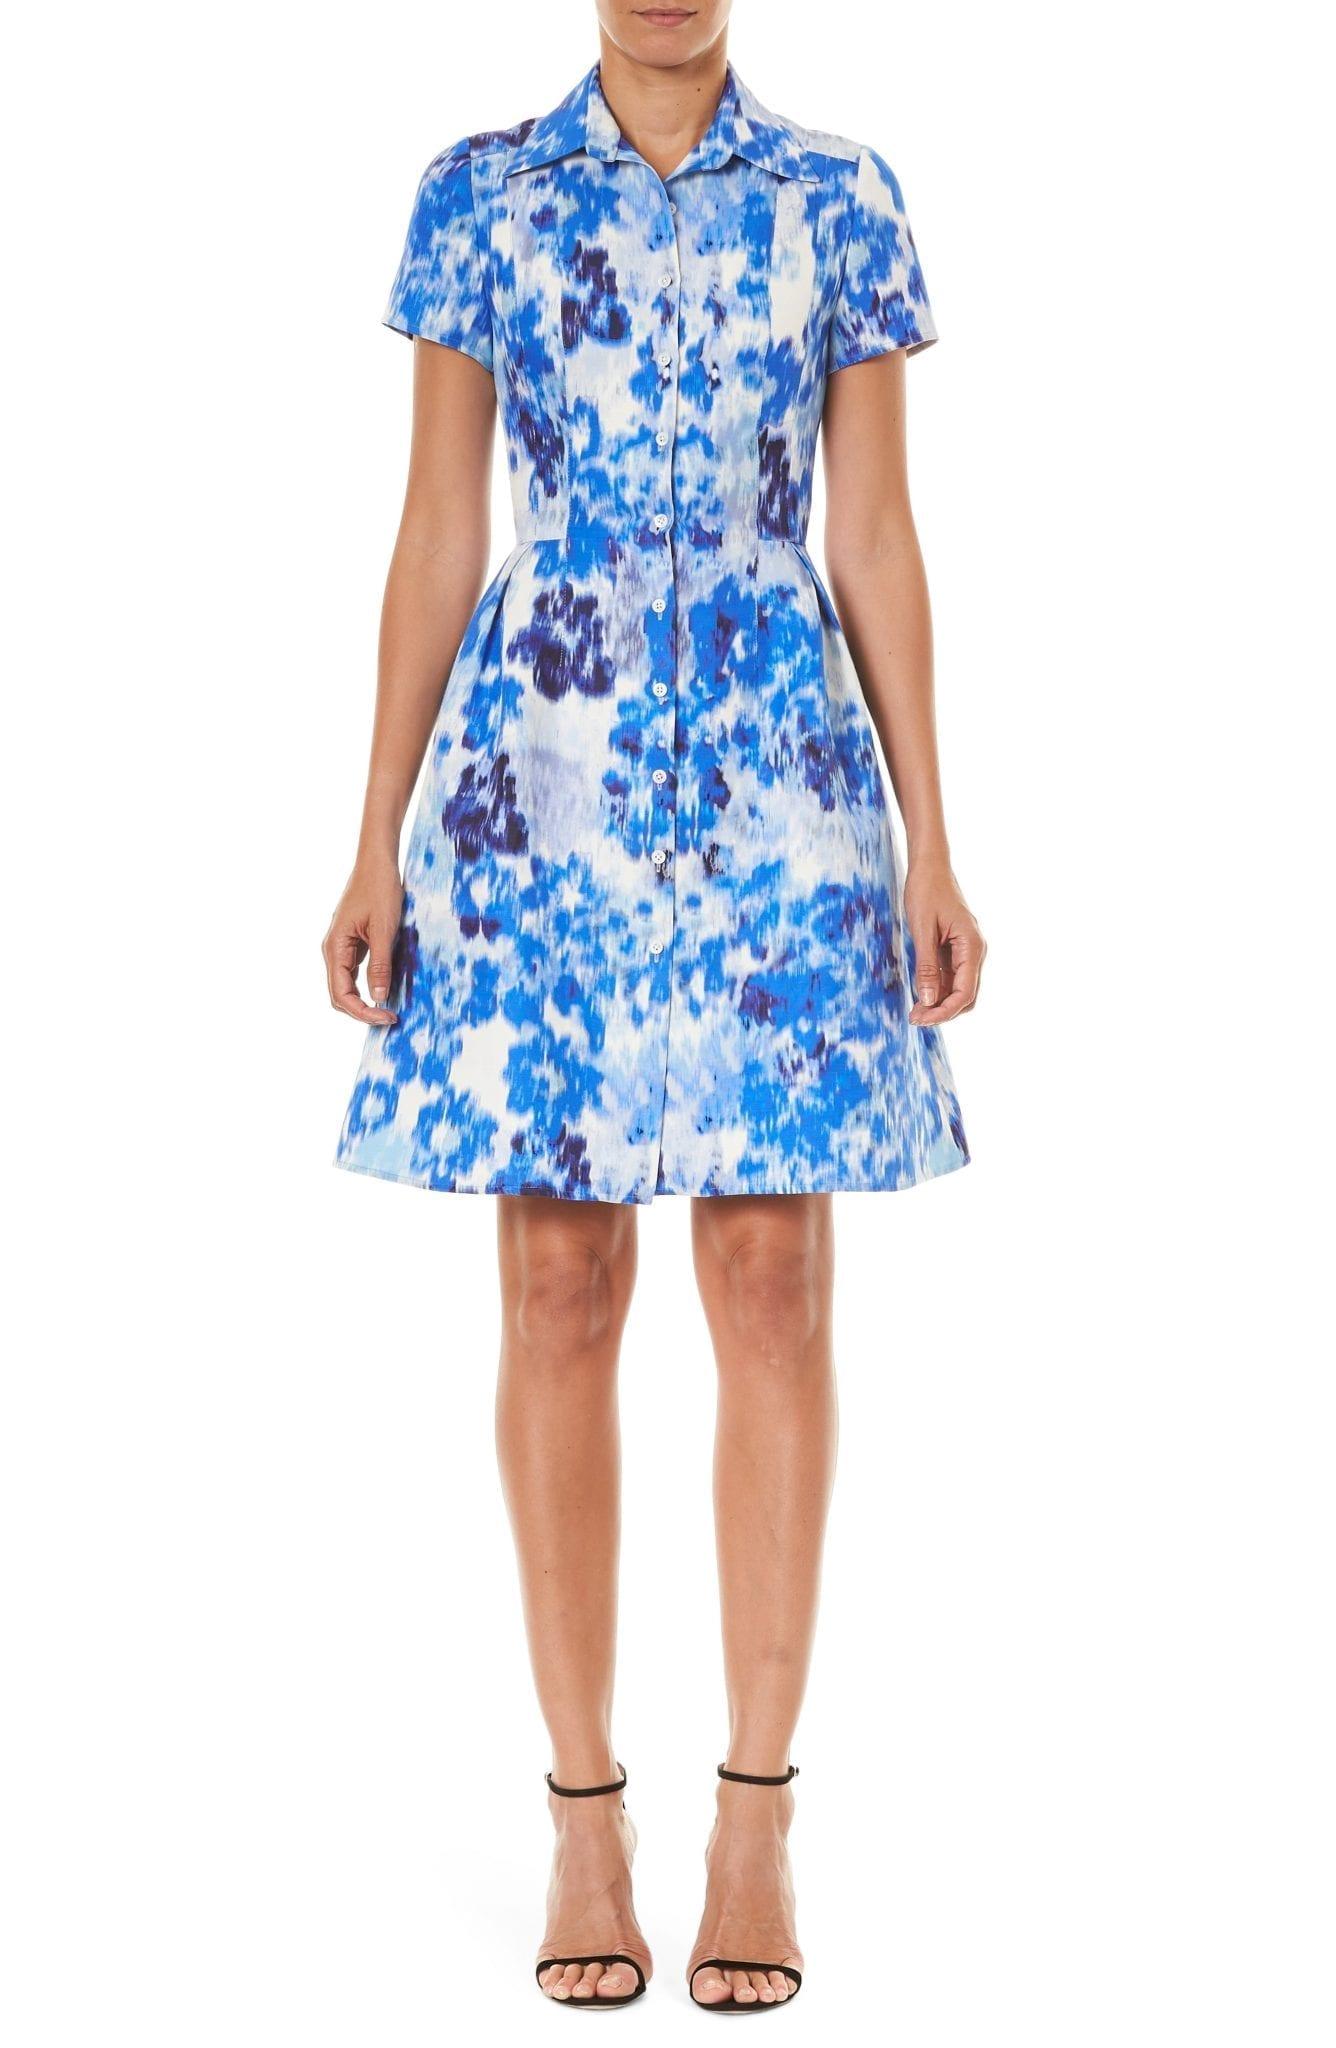 CAROLINA HERRERA Floral Print Cotton & Silk Mini Shirt Dress